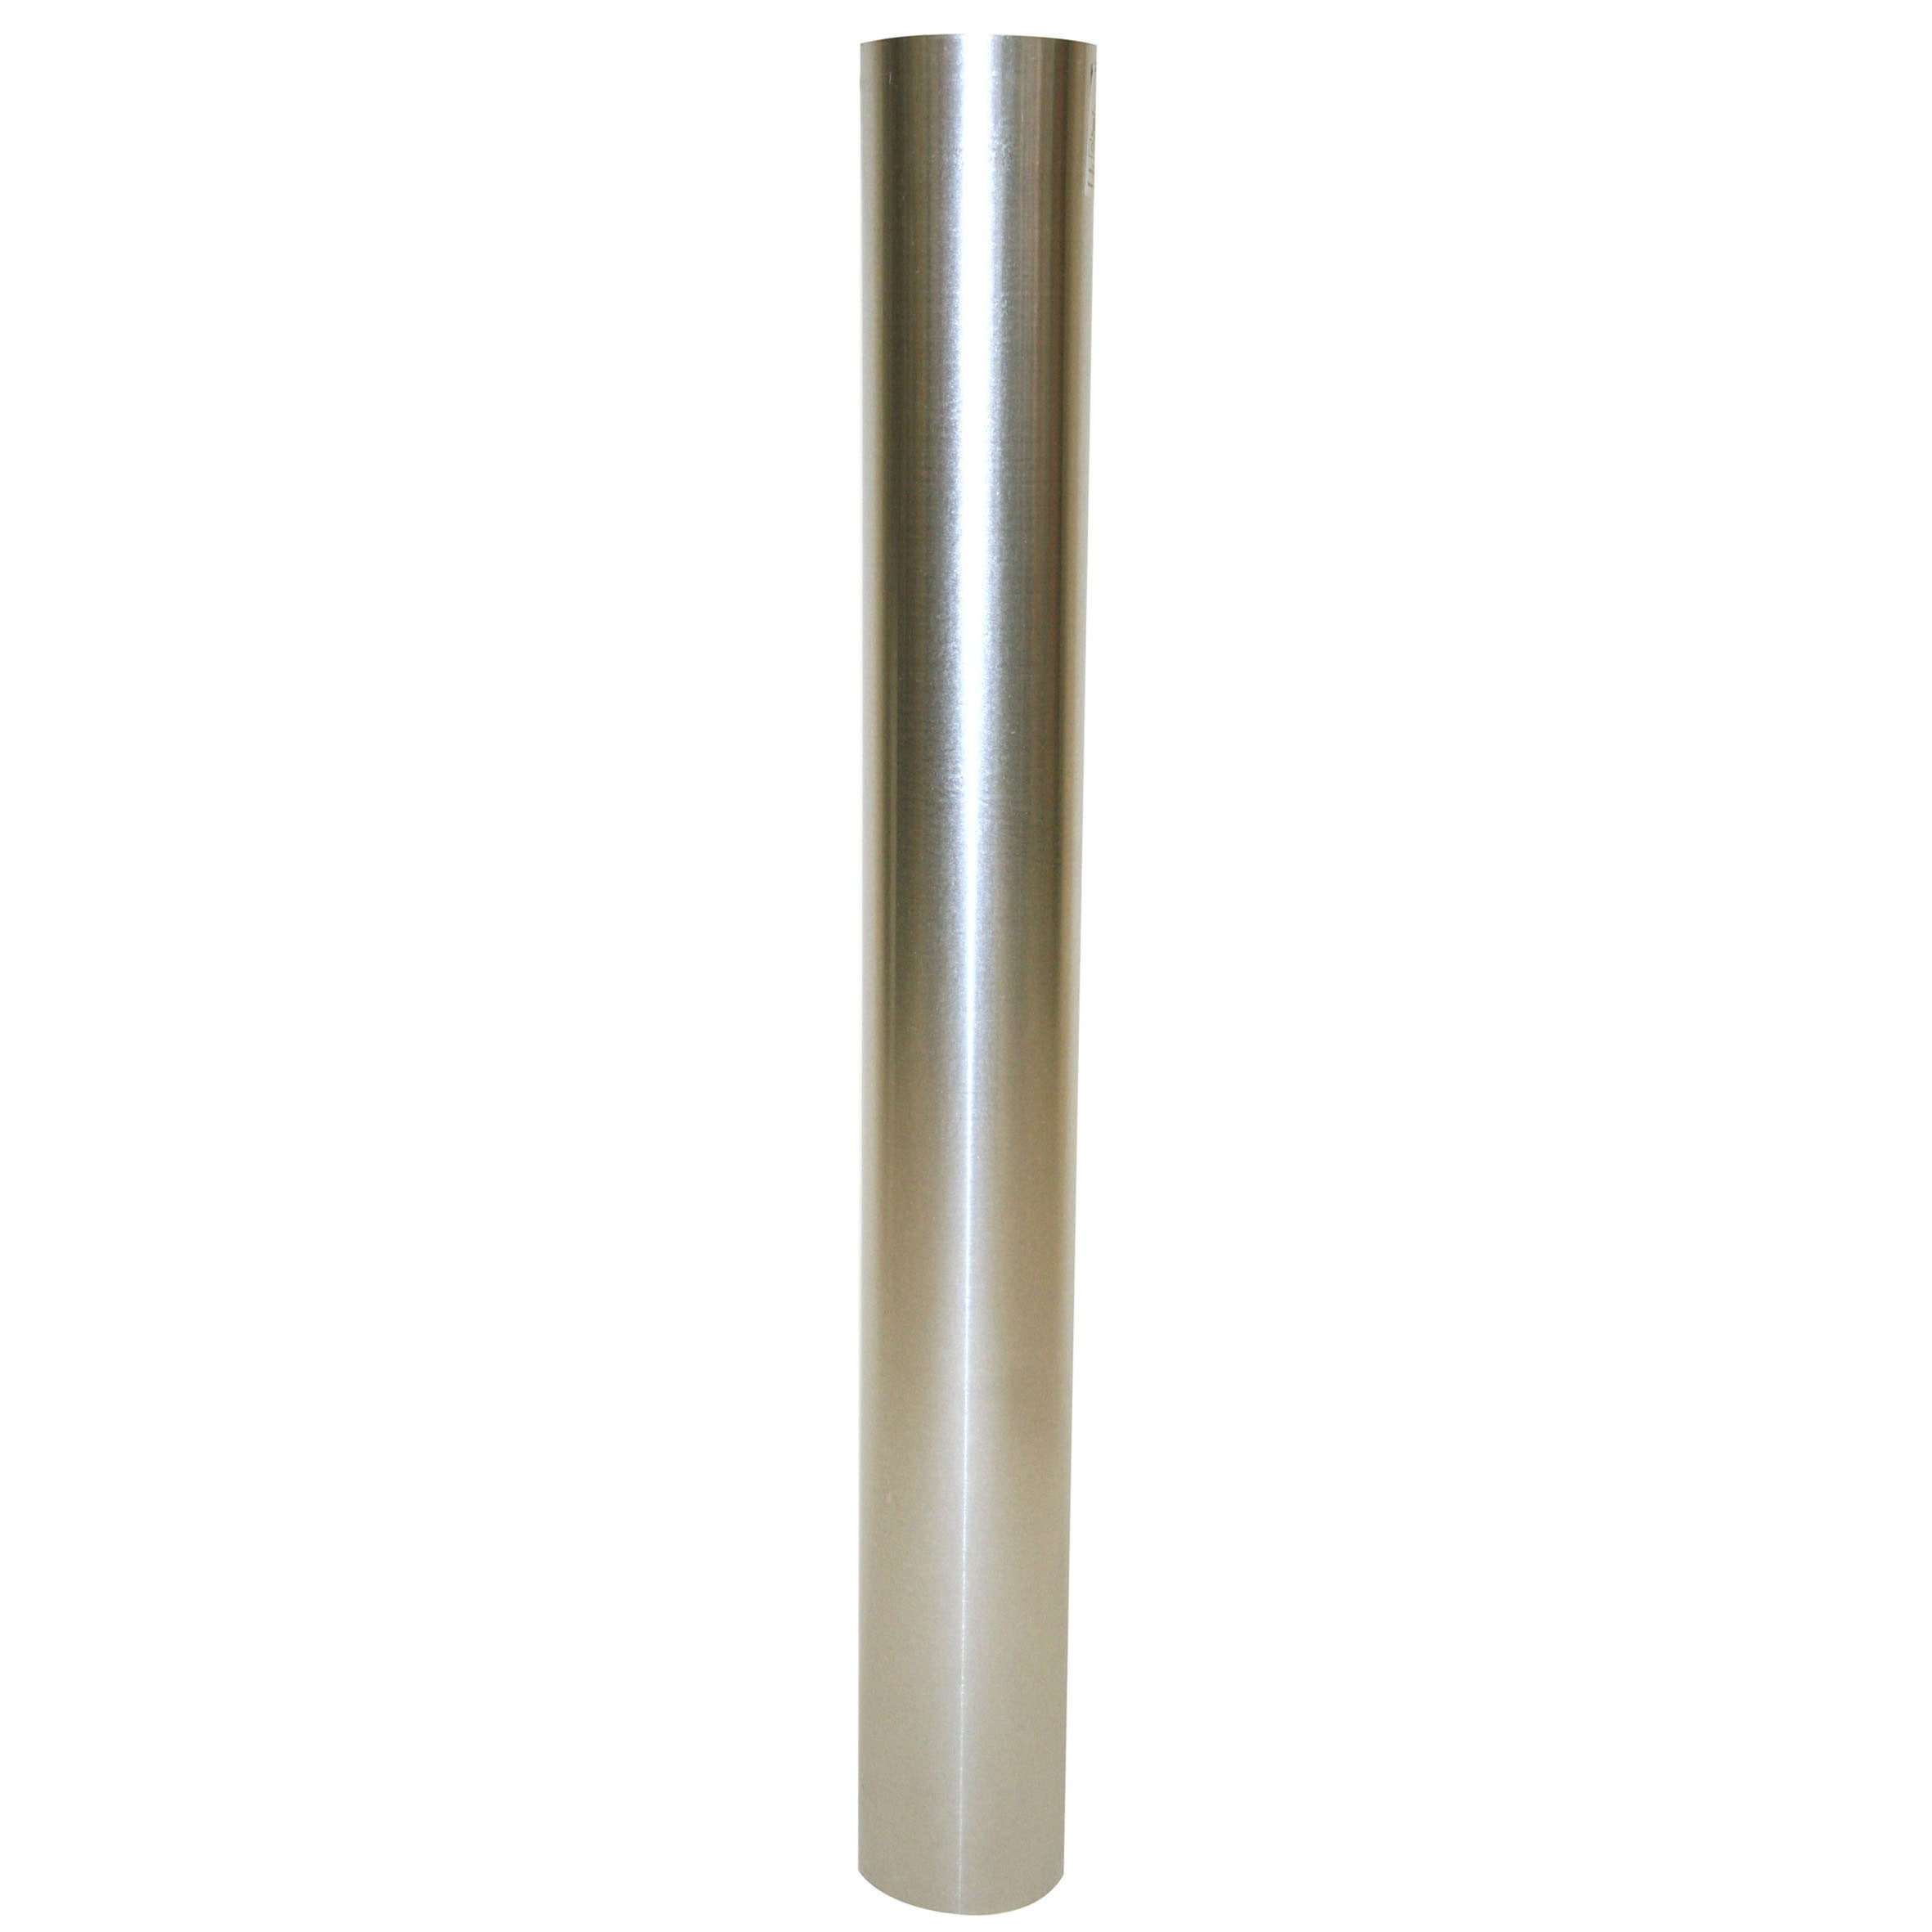 Ofenrohr / Rauchrohr KaminoFlam FAL Ø 100 mm Länge 1000 mm Bild 1